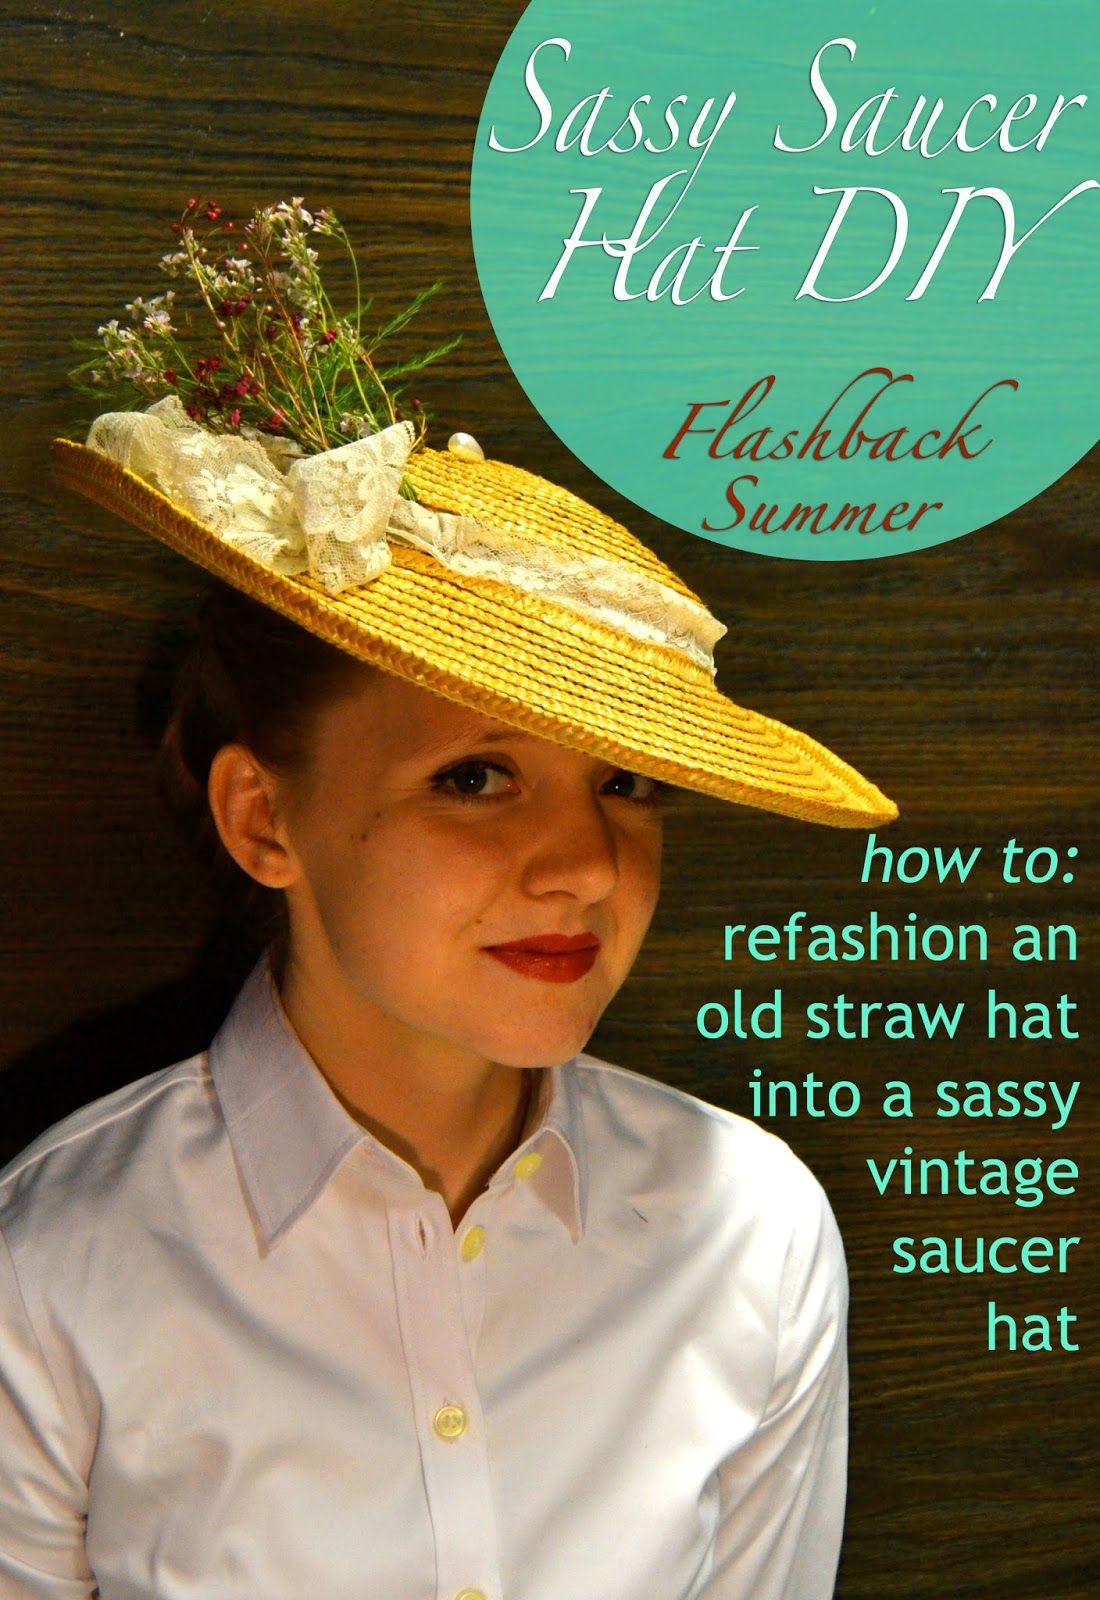 I Ve Got A Fun Diy Refashion Tutorial On How To Turn An Old Cheap Straw Hat Which I Foolishly Forgot To Take A Proper Diy Hat Straw Hat Diy Diy Straw